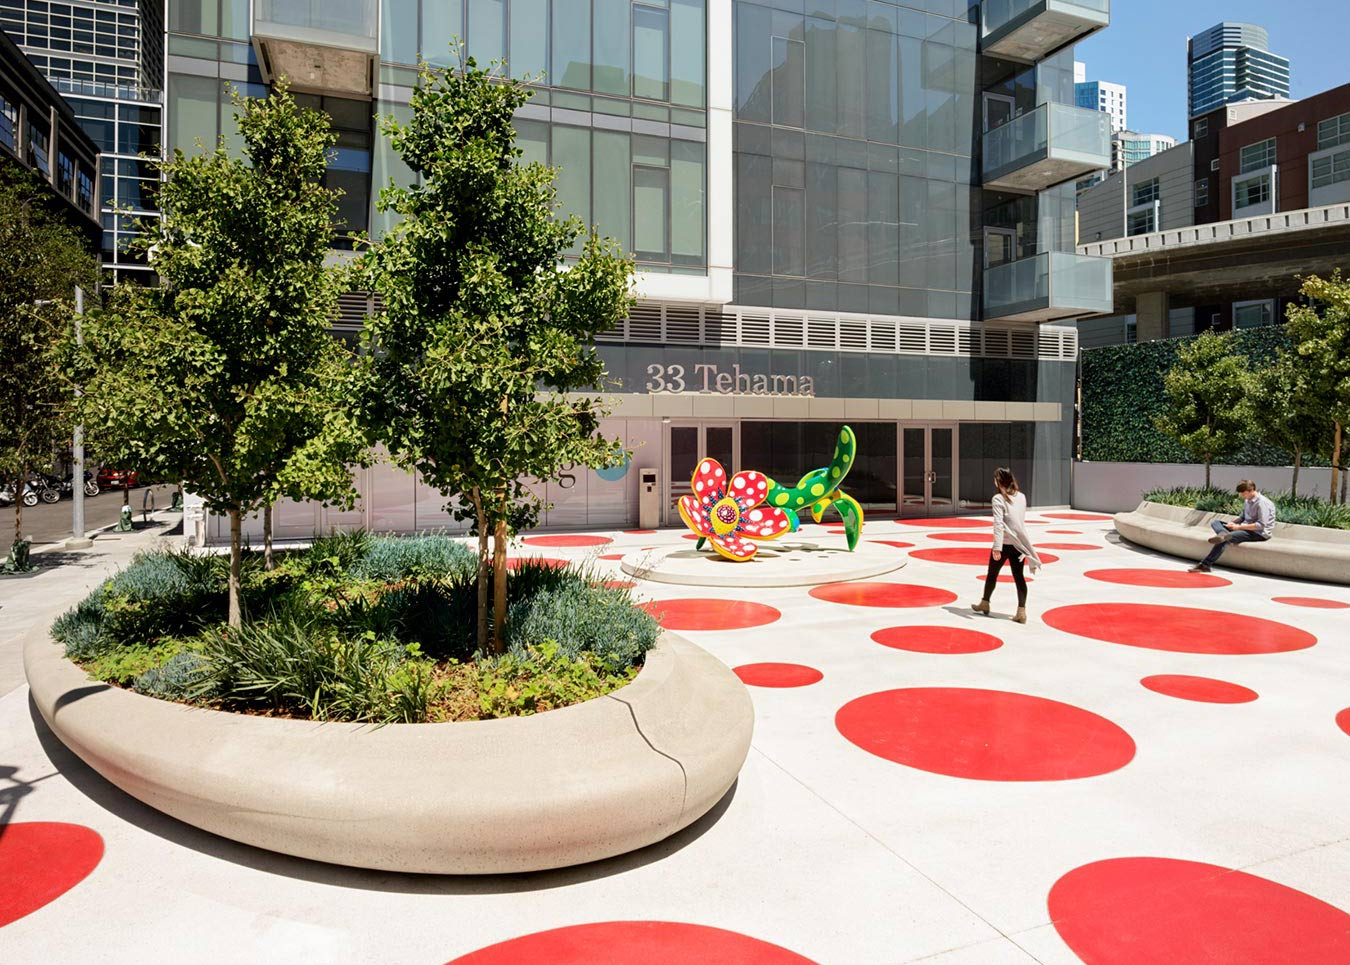 33 Tehama Plaza + Oscar Park